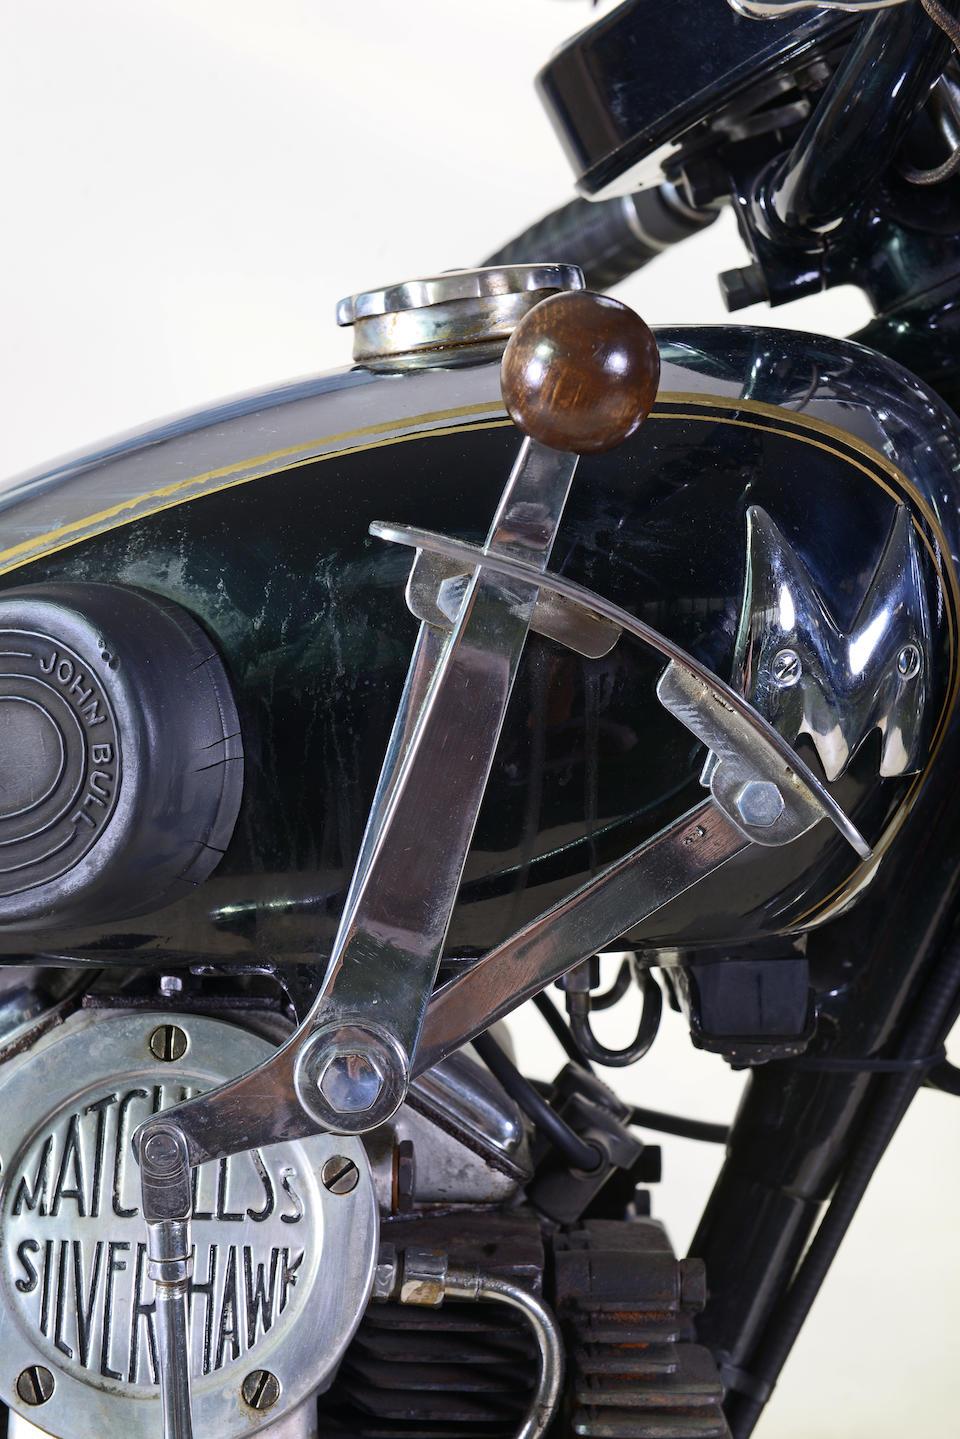 1934 Matchless 592cc Silver Hawk Frame no. 964 Engine no. 34B 1855